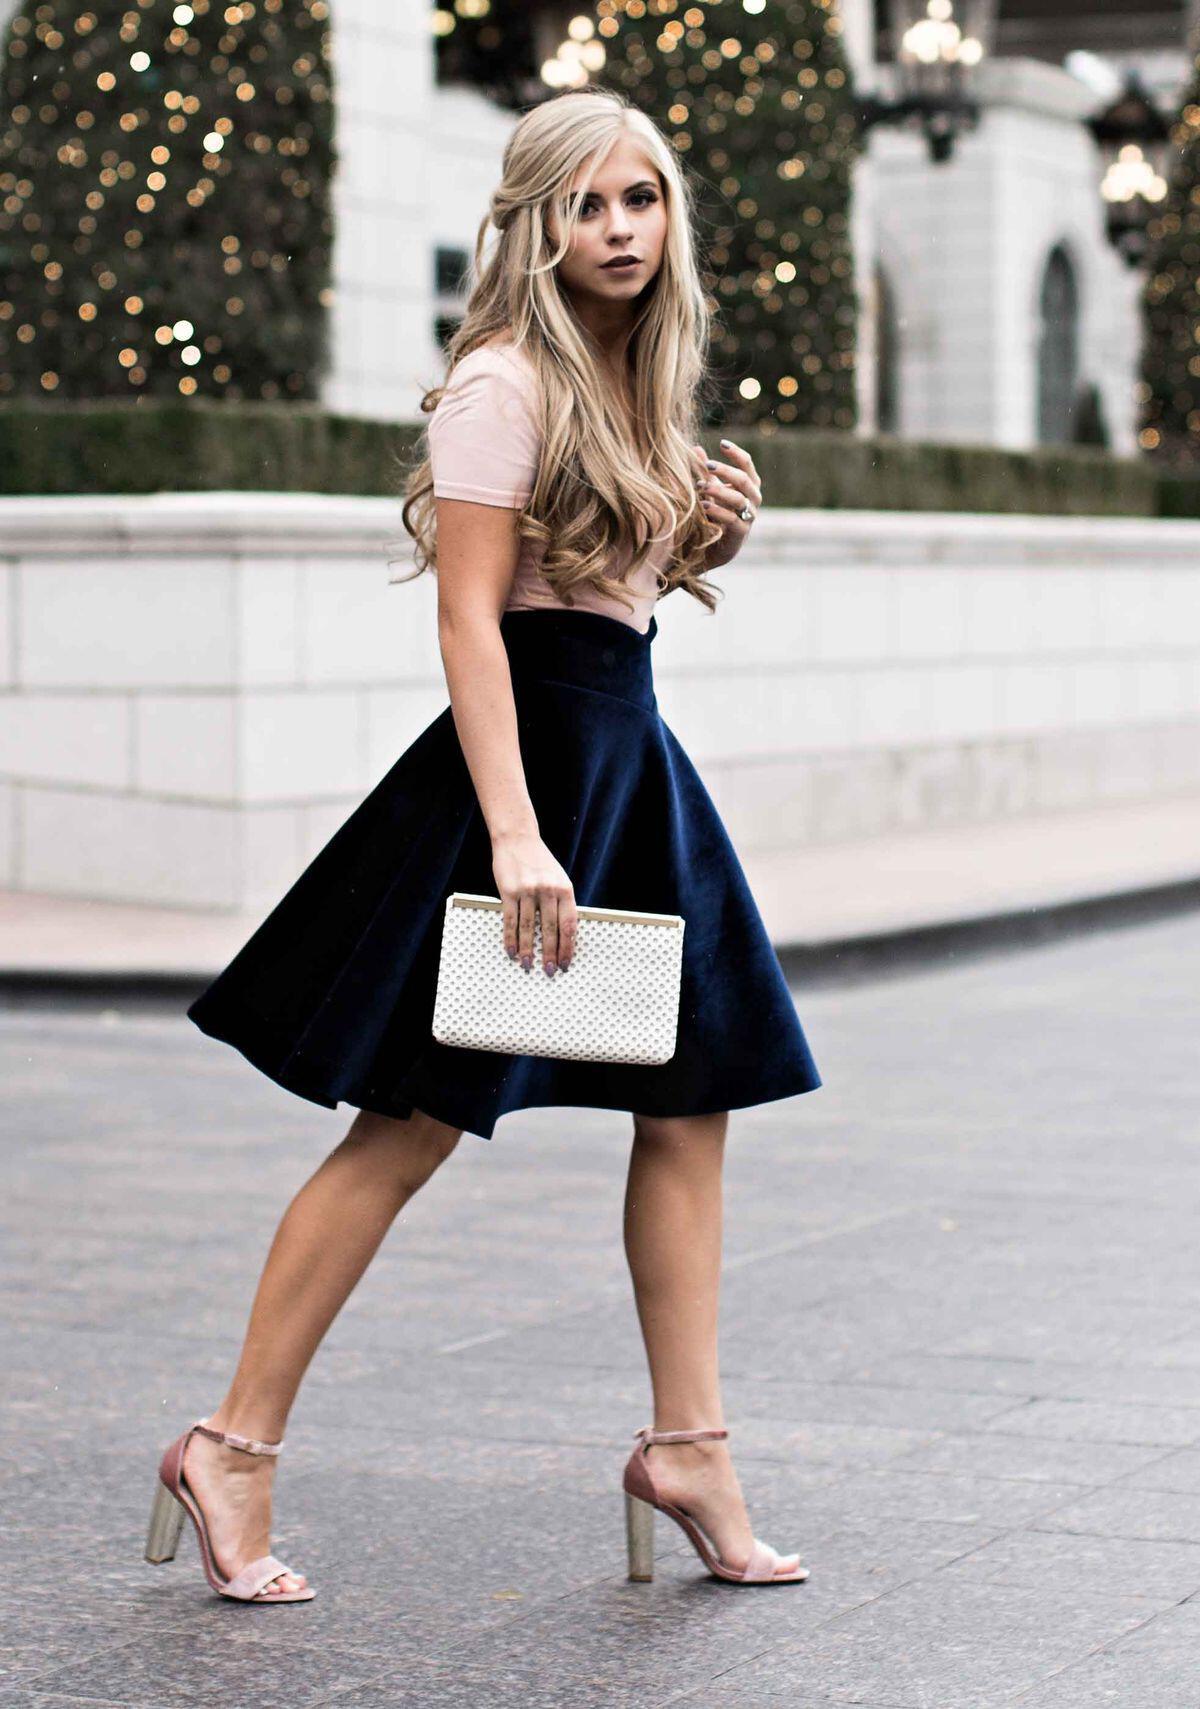 how to wear velvet outfits this fall 3 - Πως να φορέσεις βελούδο το χειμώνα